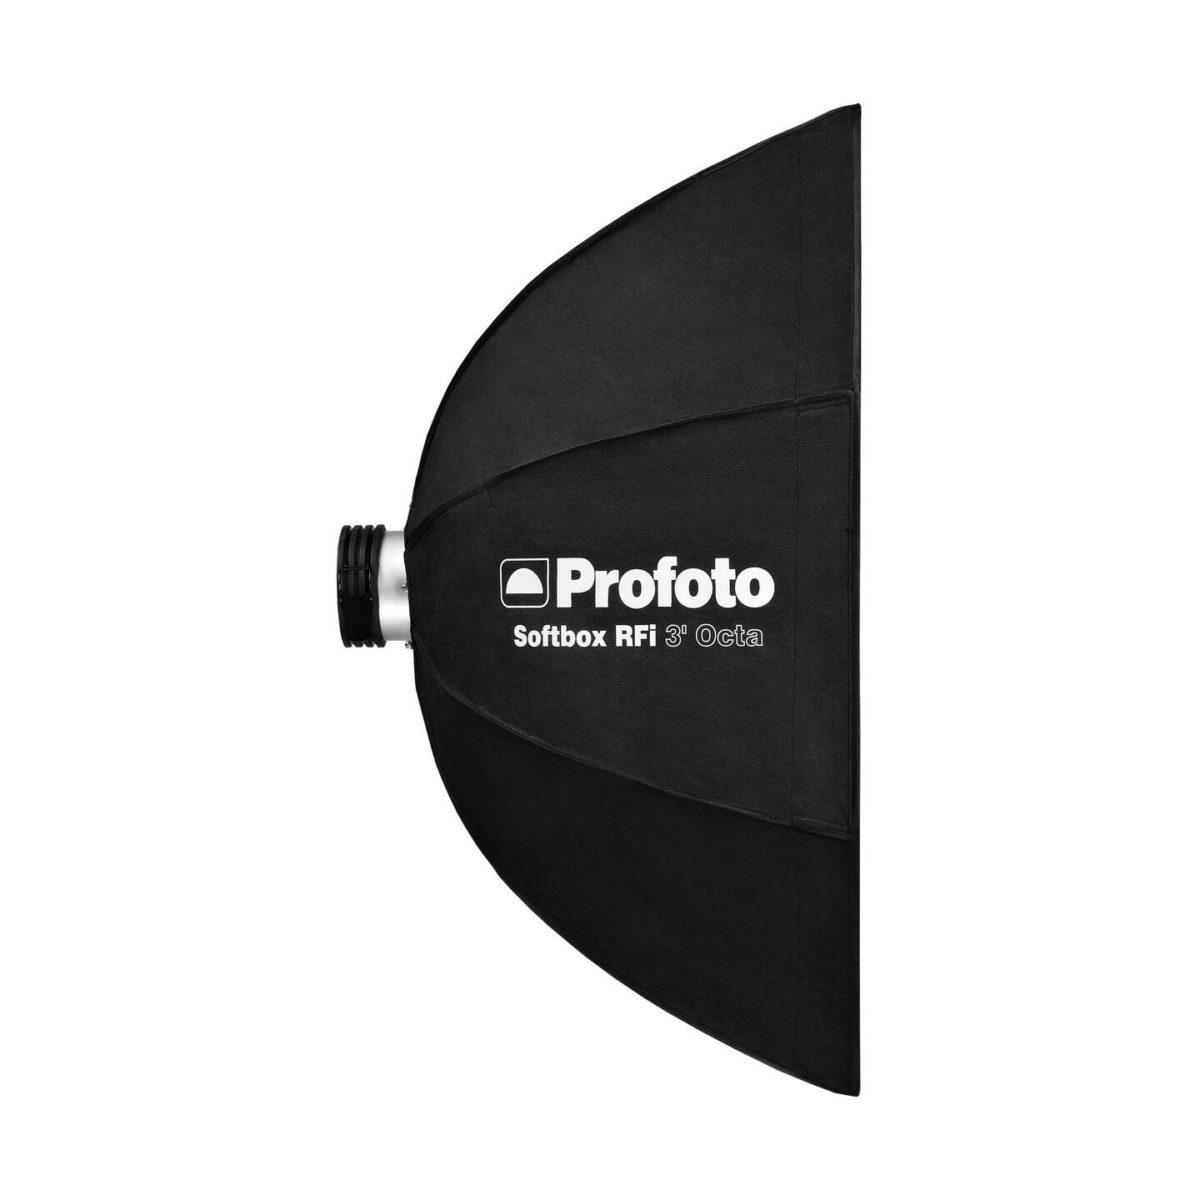 profoto_rfi_softbox_3_octa_01